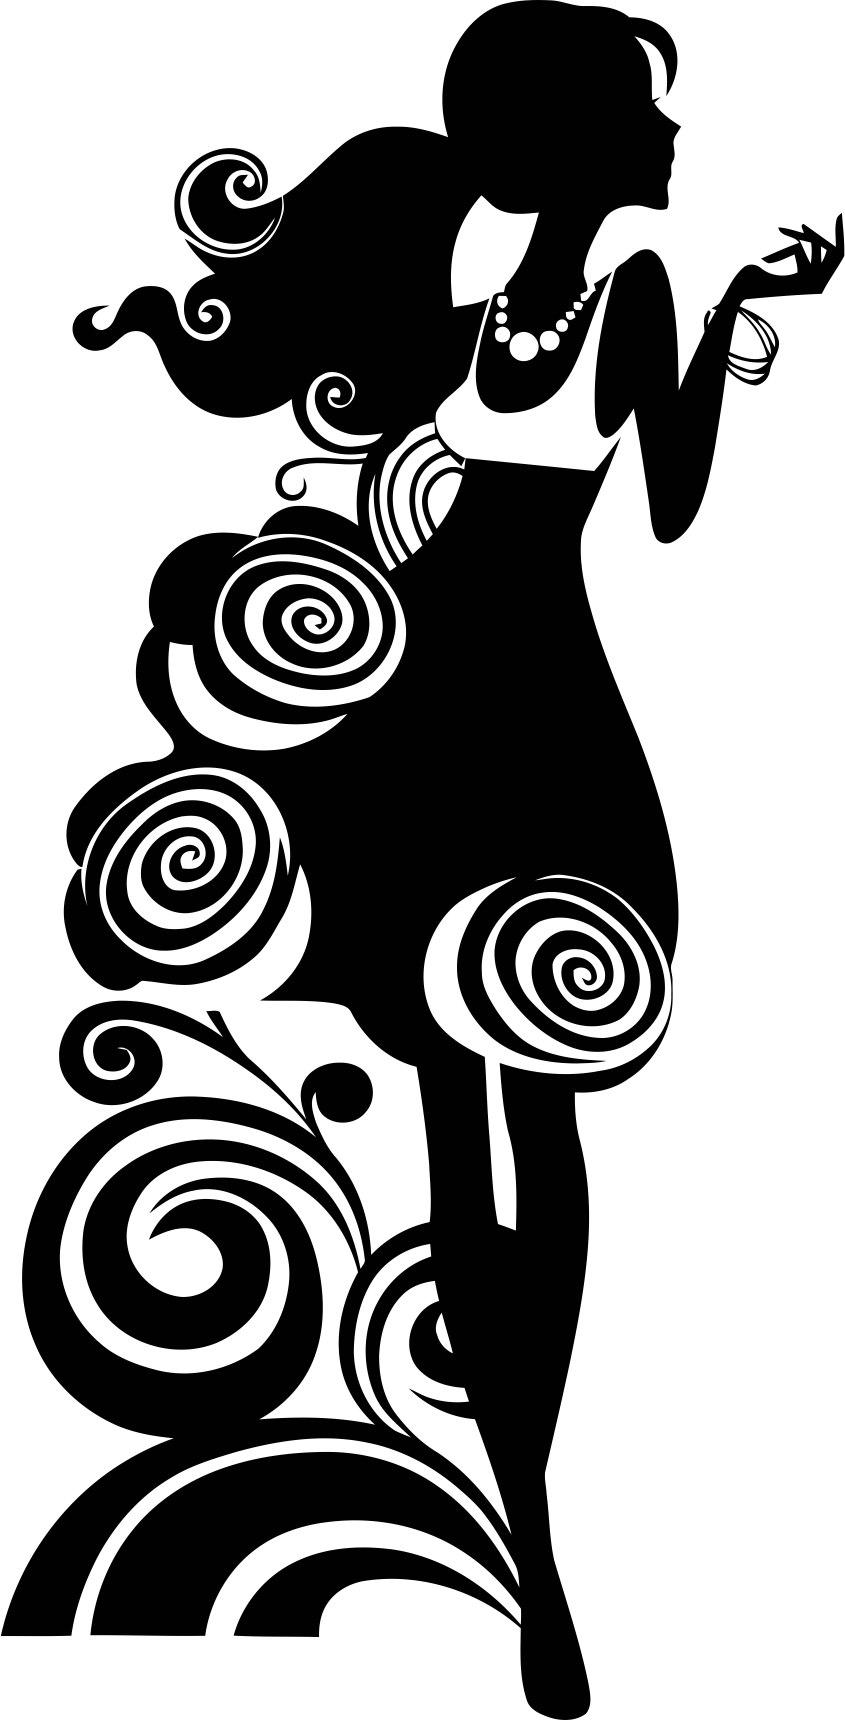 Silhouette Of Elegant Woman File Free CDR Vectors Art